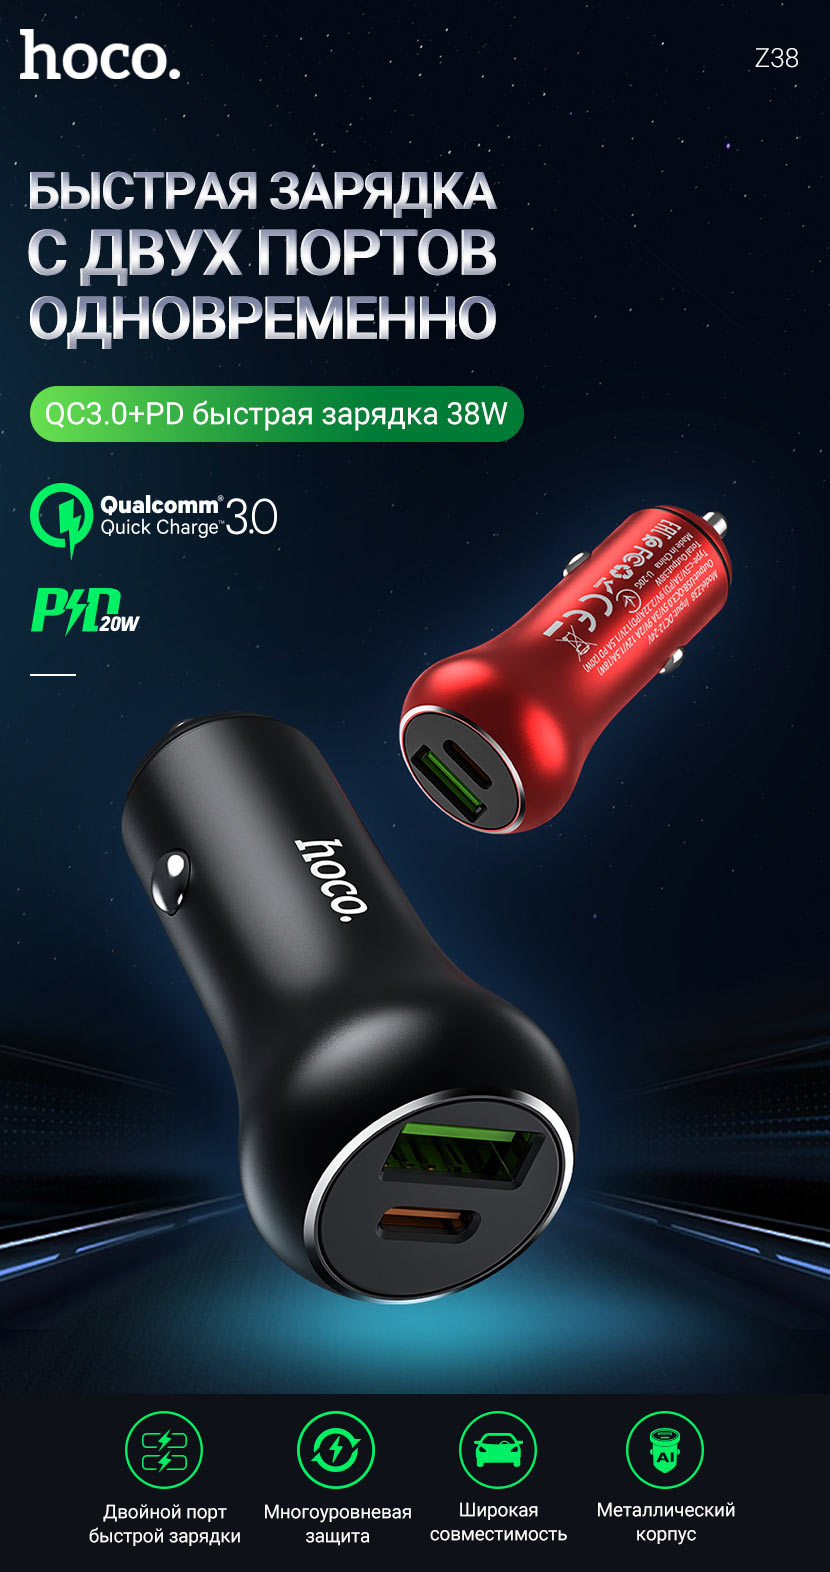 hoco news z38 resolute pd20w qc3 car charger ru